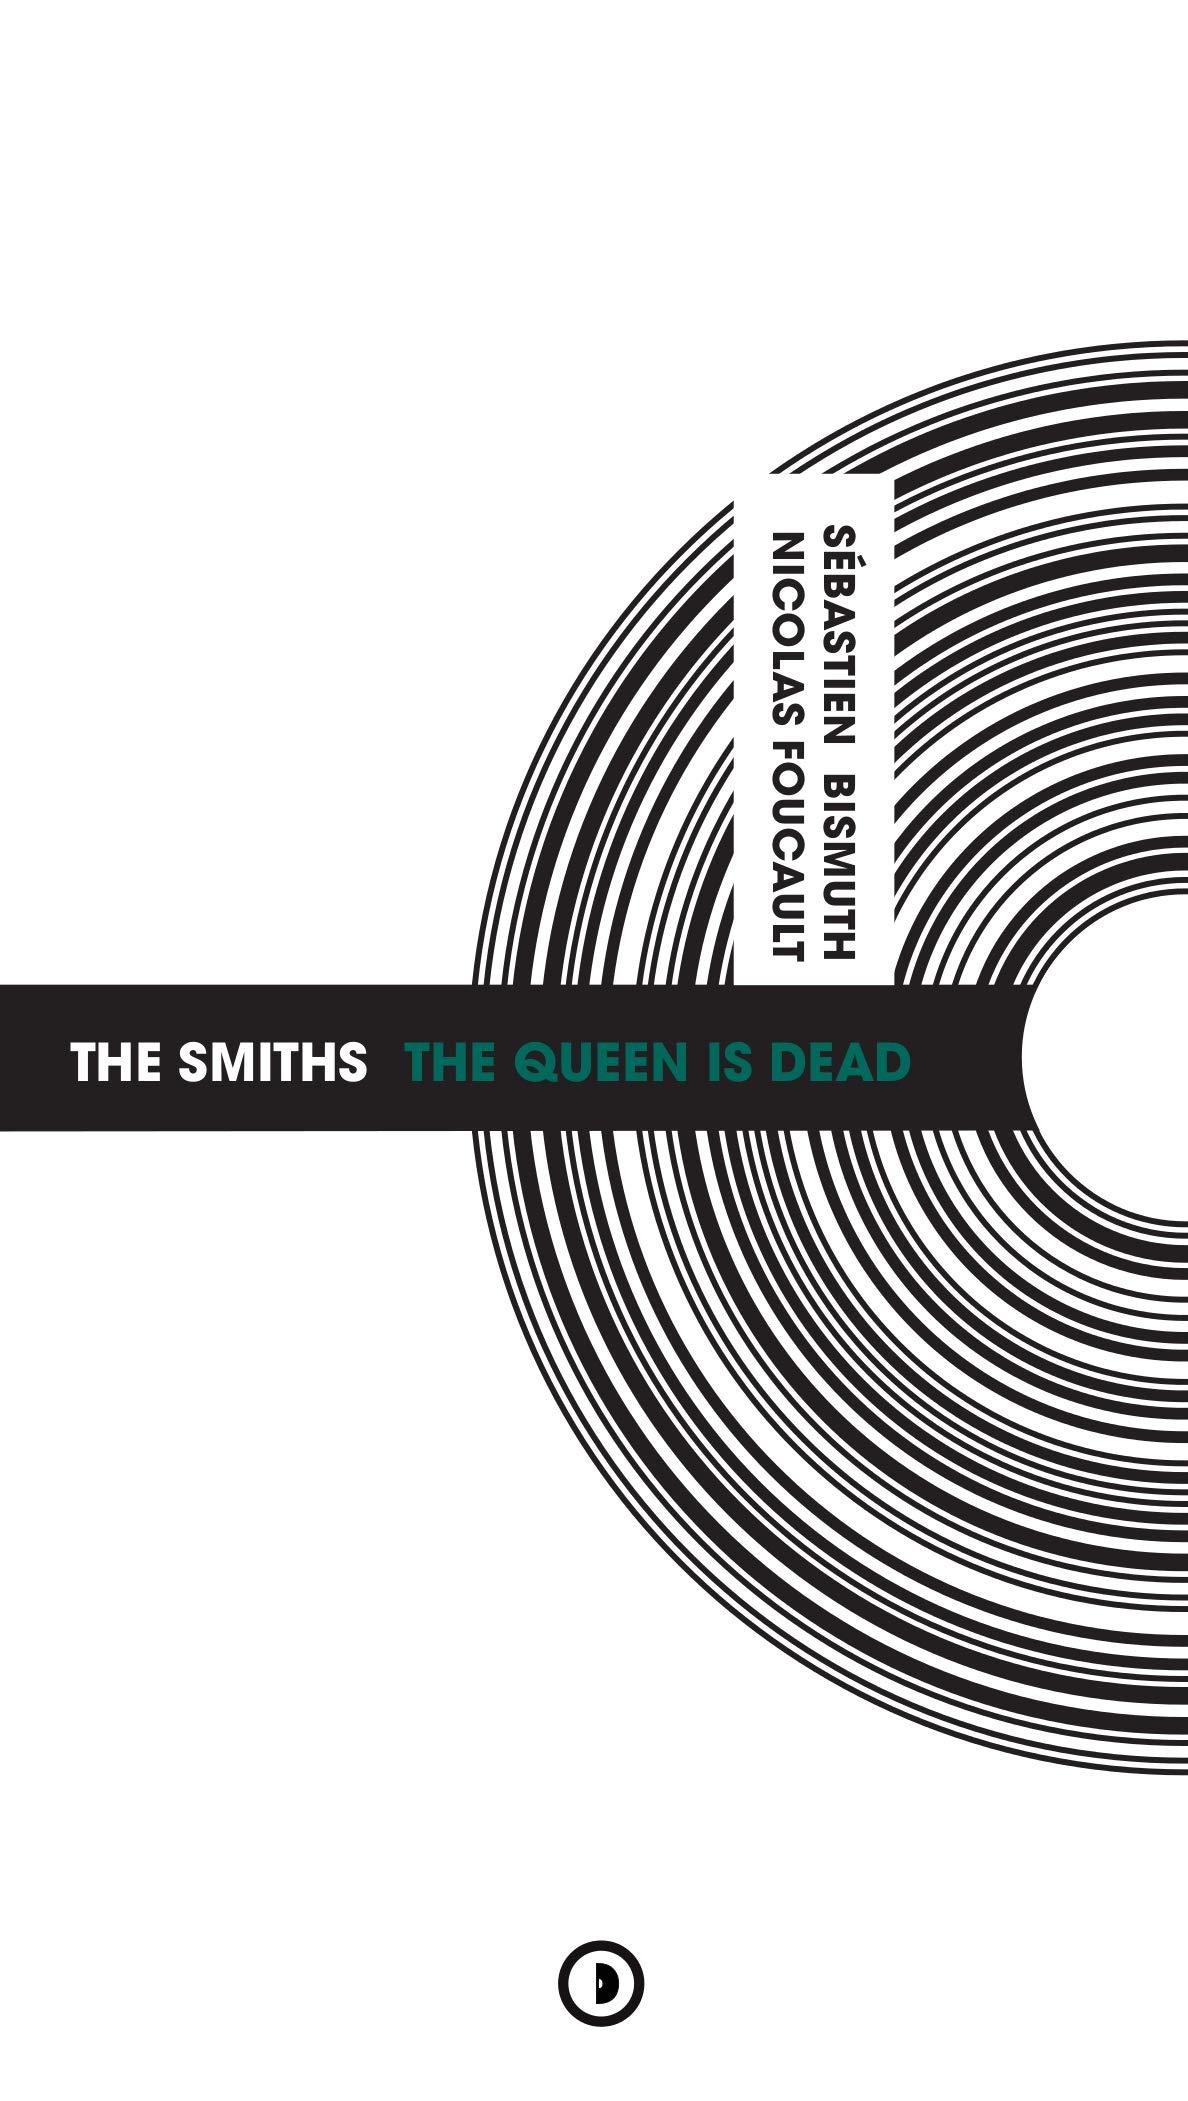 News Littéraires – The Smiths – The Queen Is Dead – Sébastien Bismuth et Nicolas Foucault